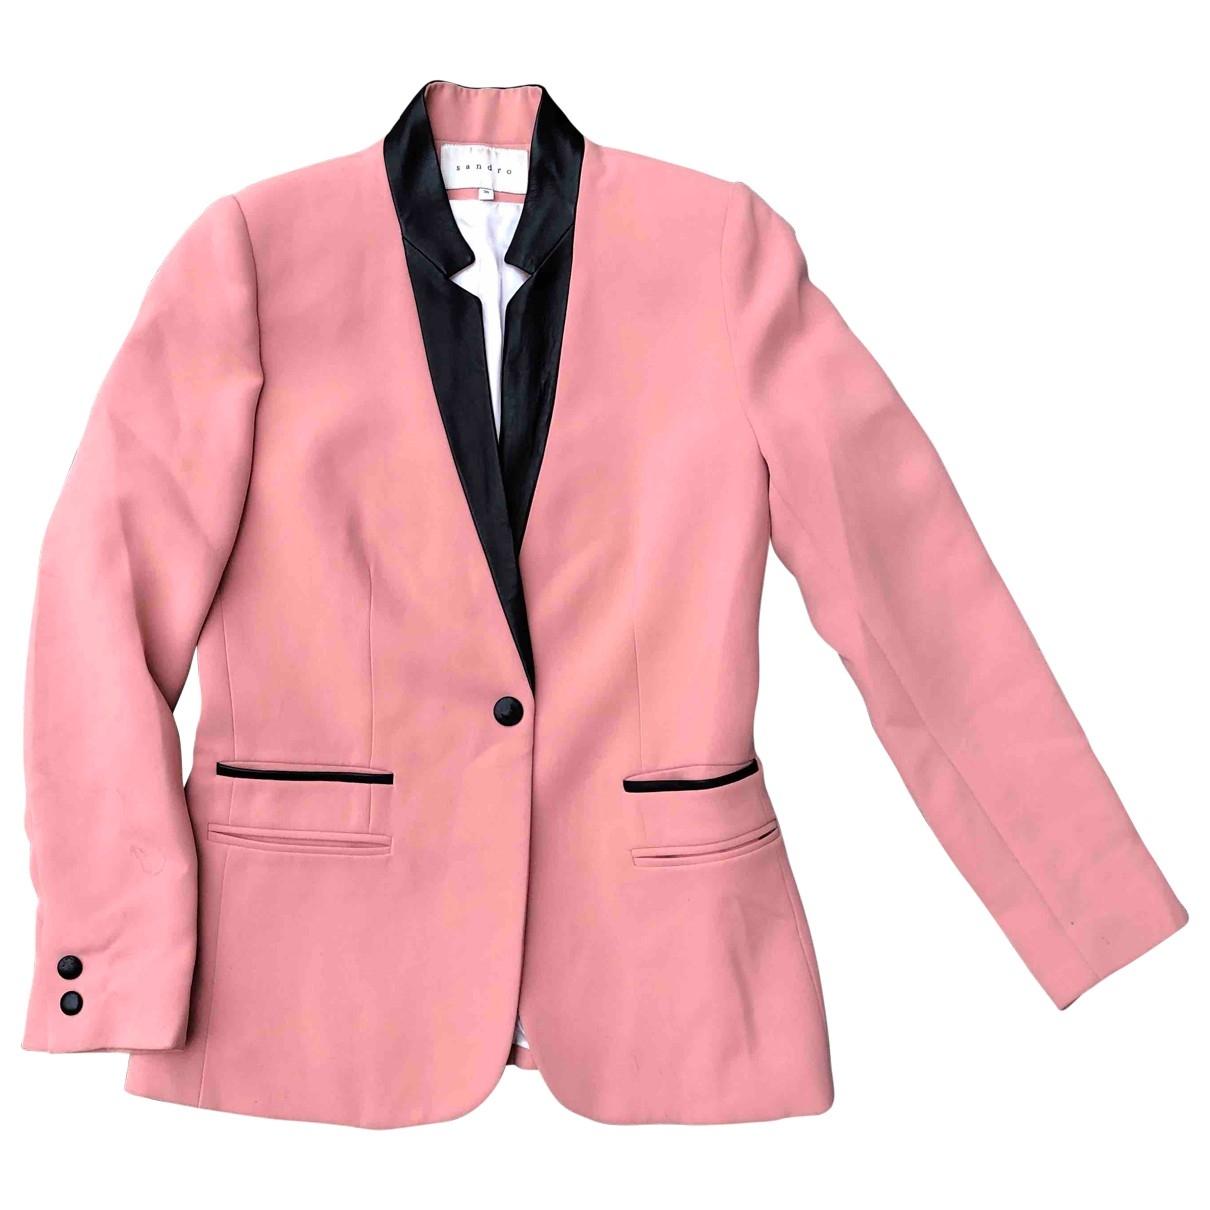 Sandro \N Pink jacket for Women XS International